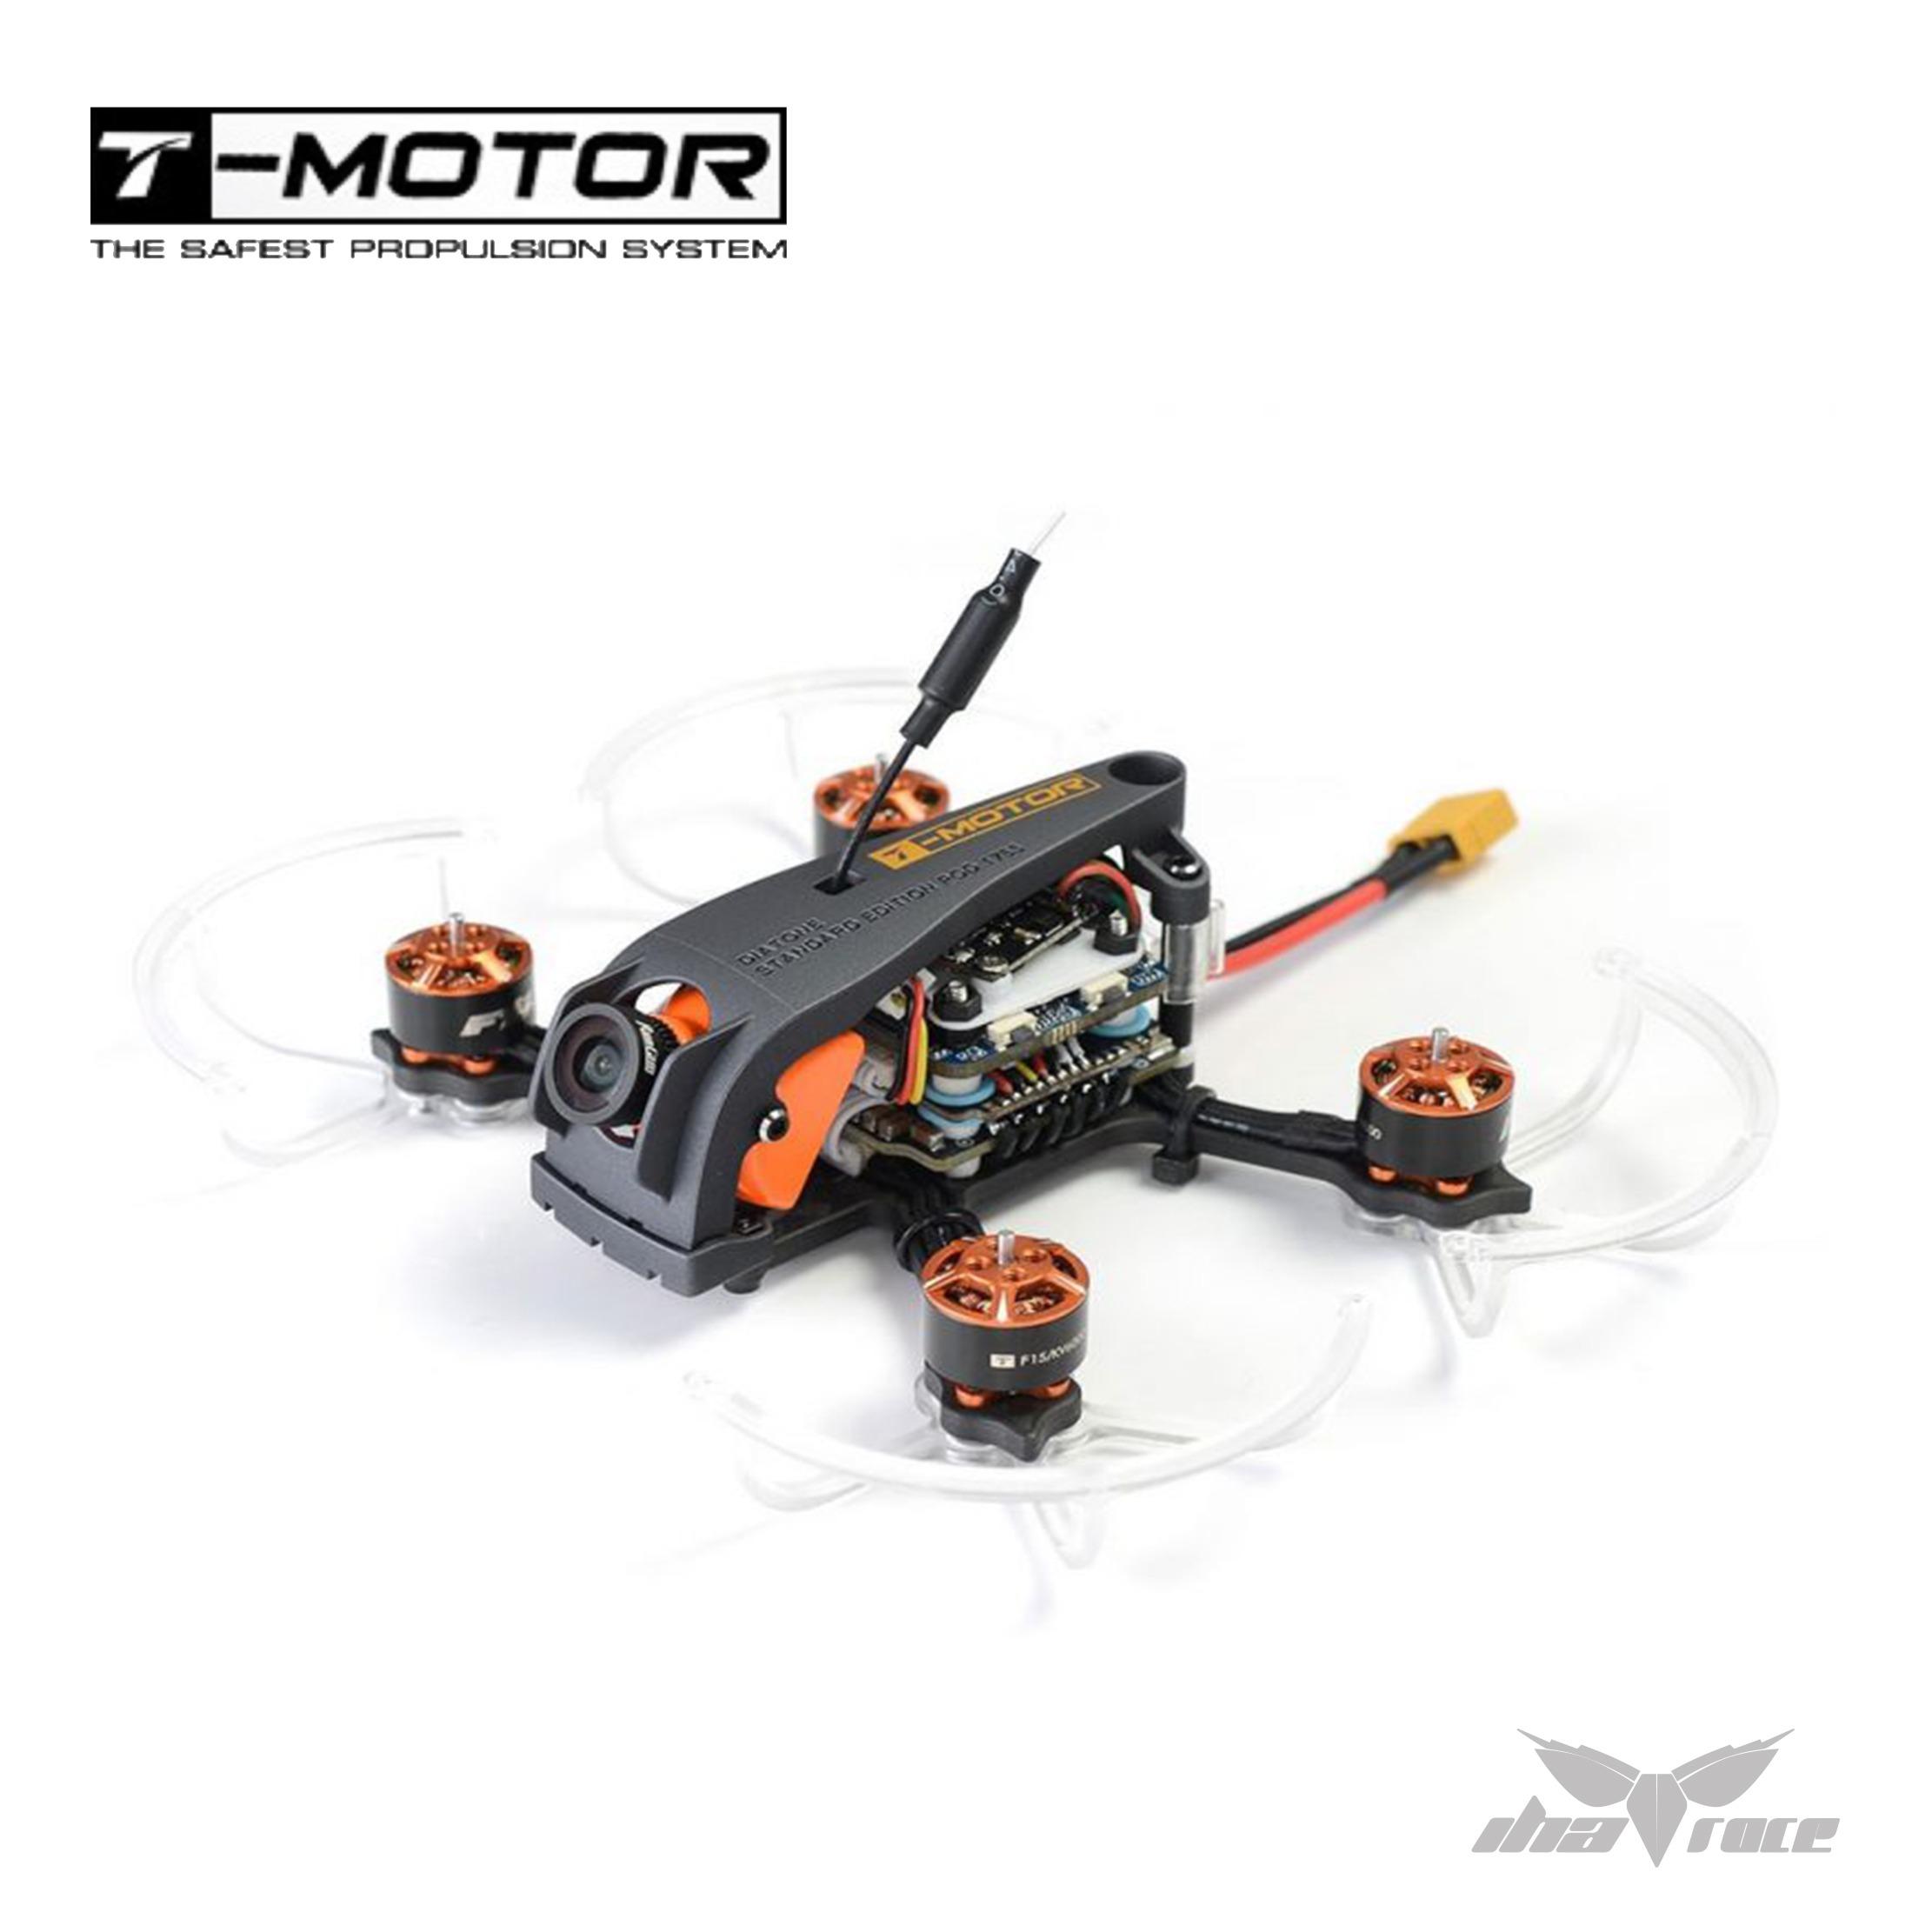 T-MOTOR TM 2419 Versión HD